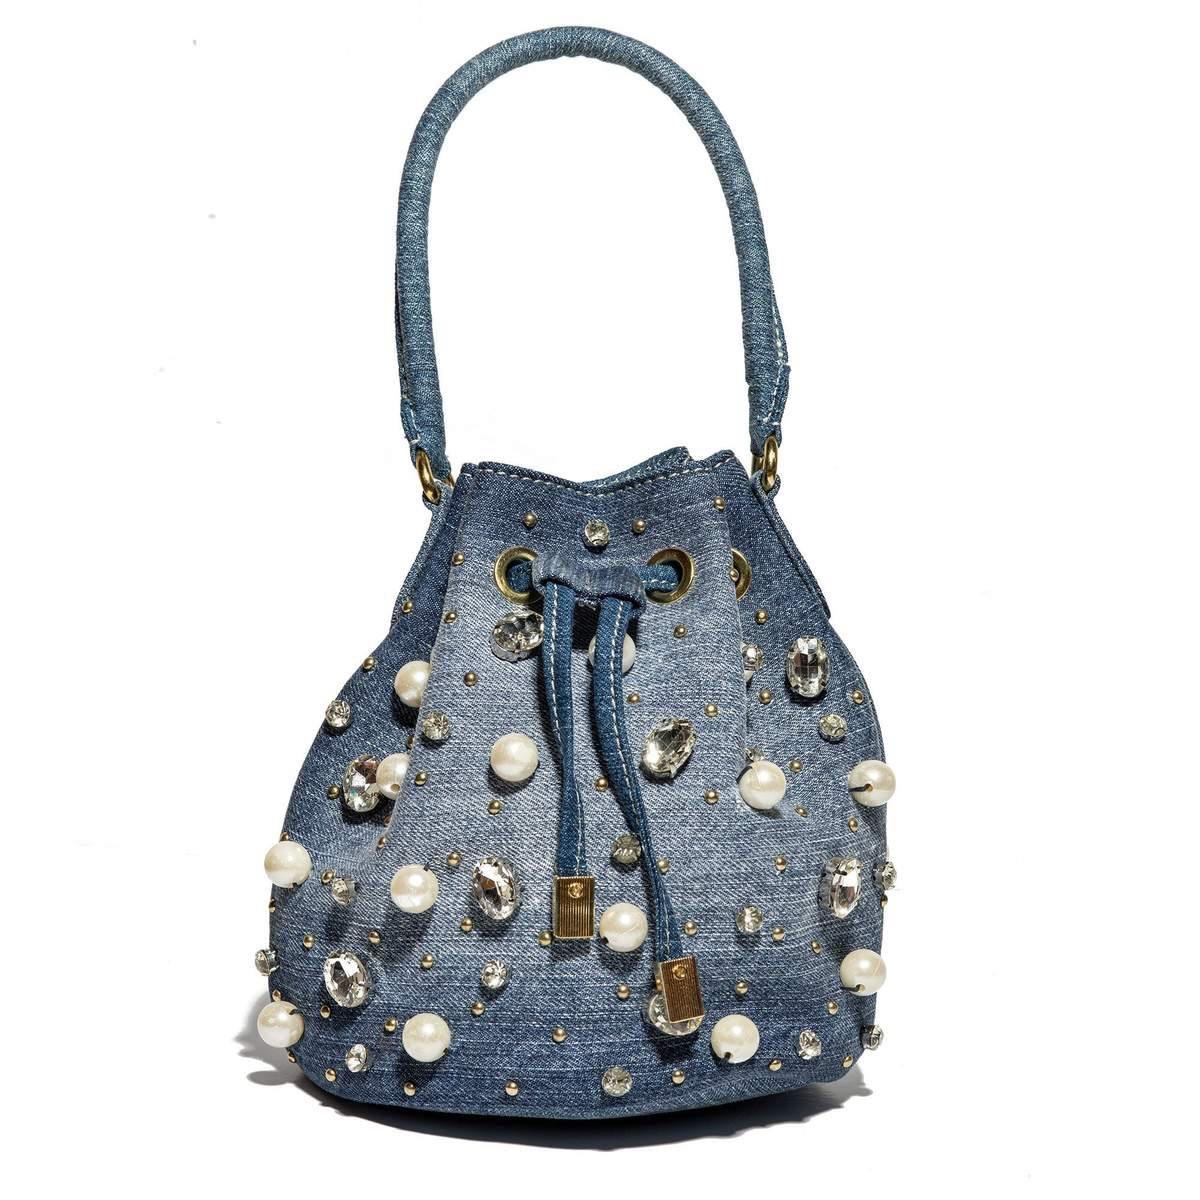 Stone Washed Denim Lucy Embellished Bucket Bag